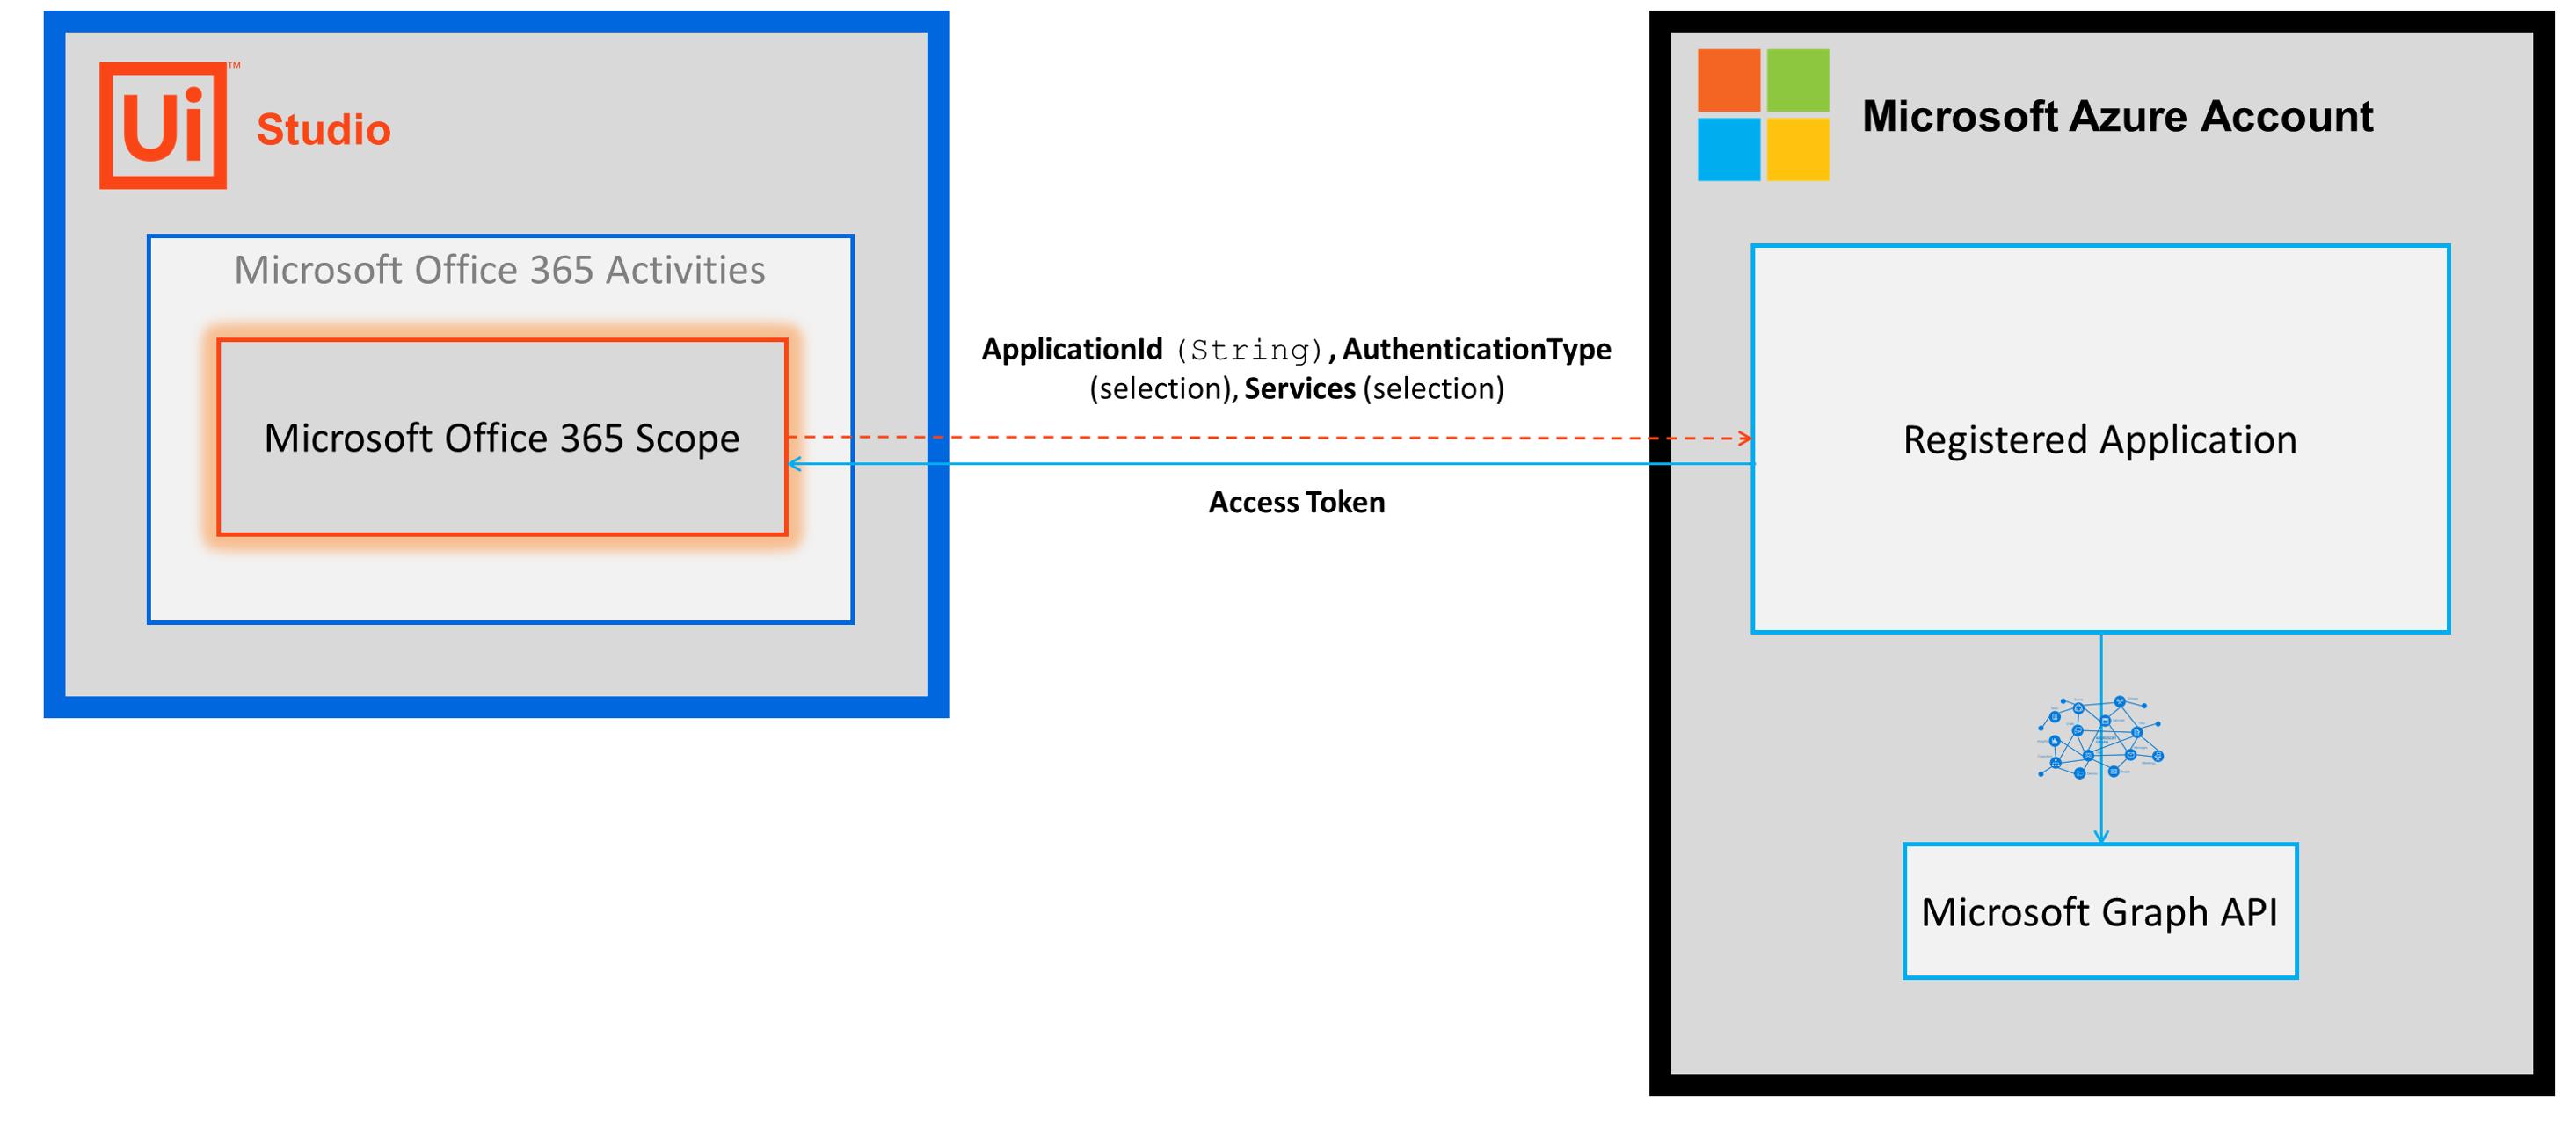 Microsoft Office 365 Scope